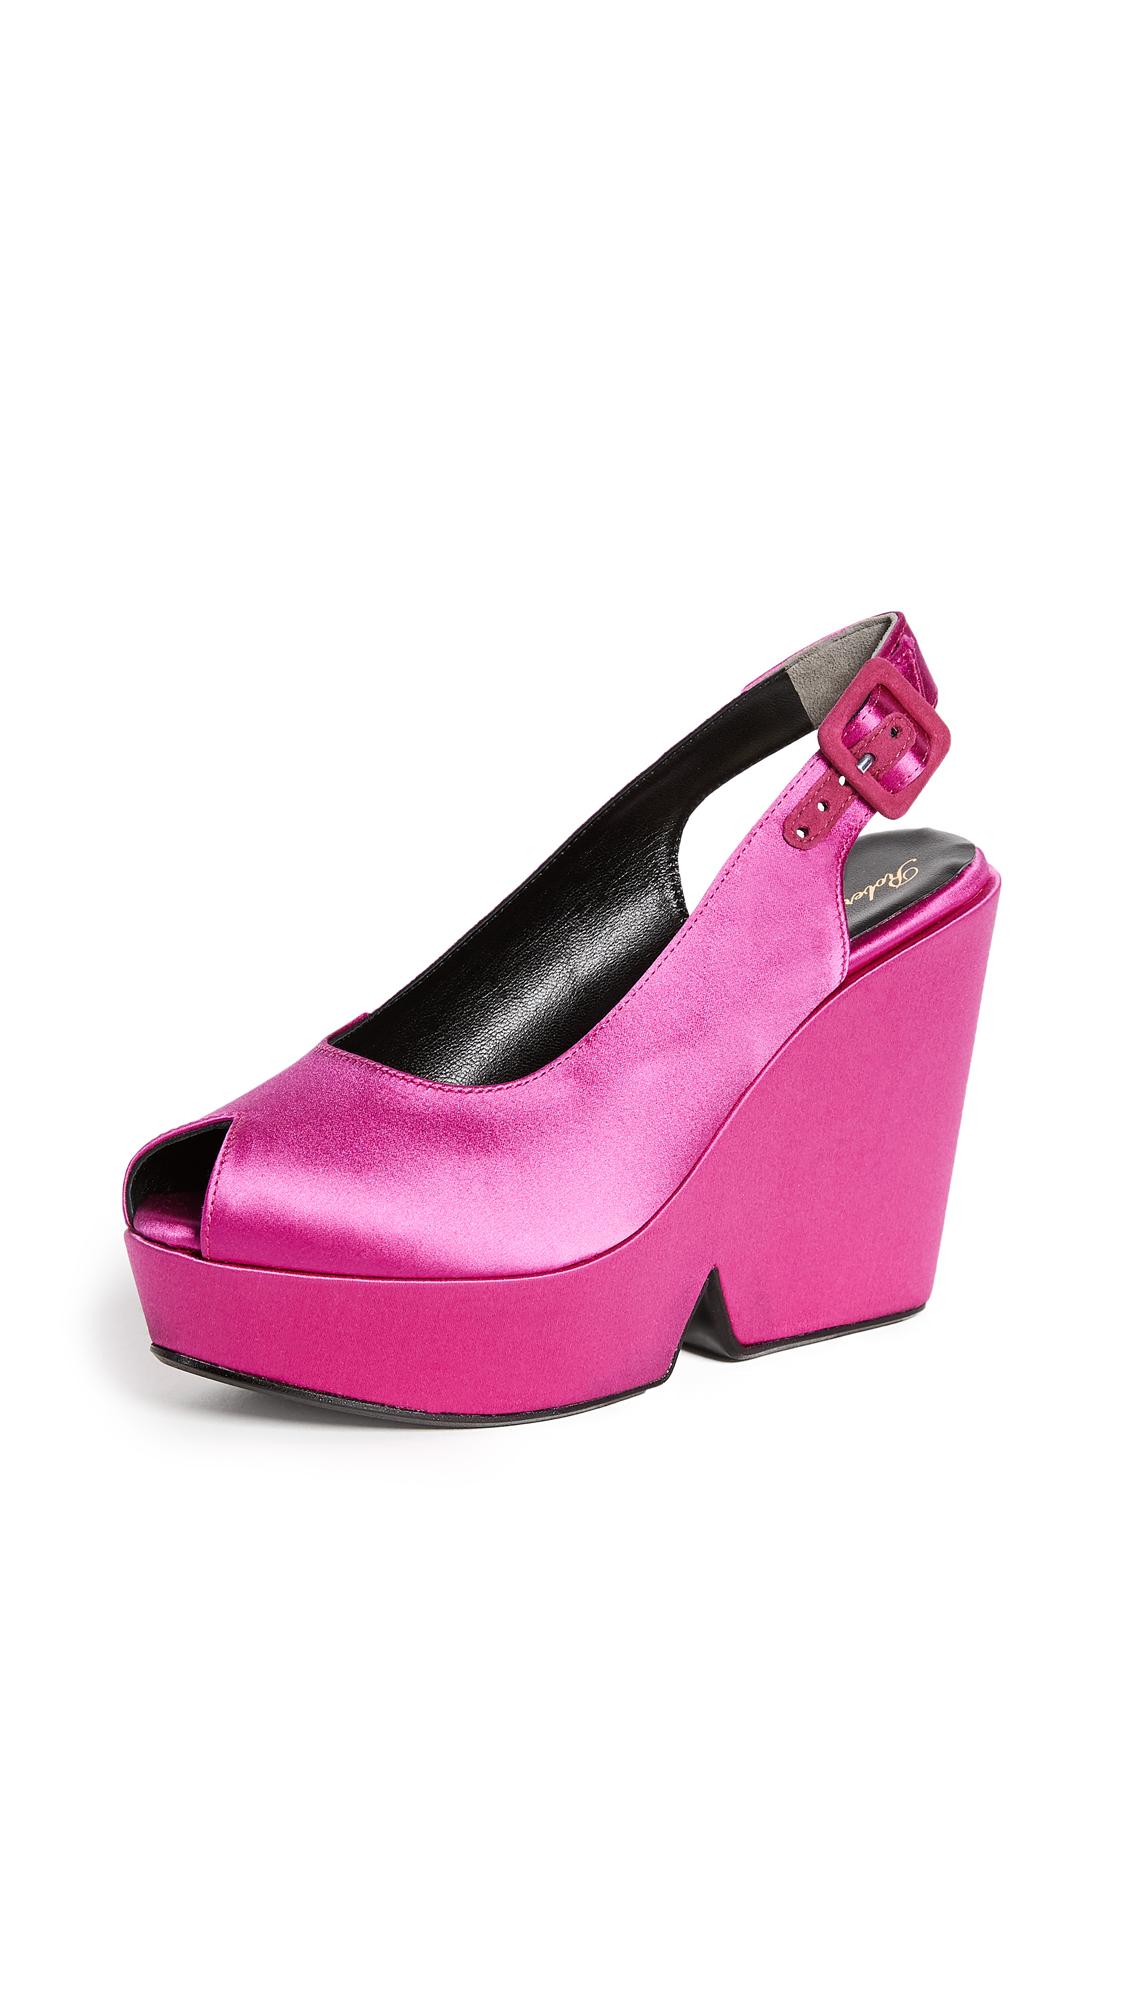 Robert Clergerie Dylann Platform Sandals - Pink